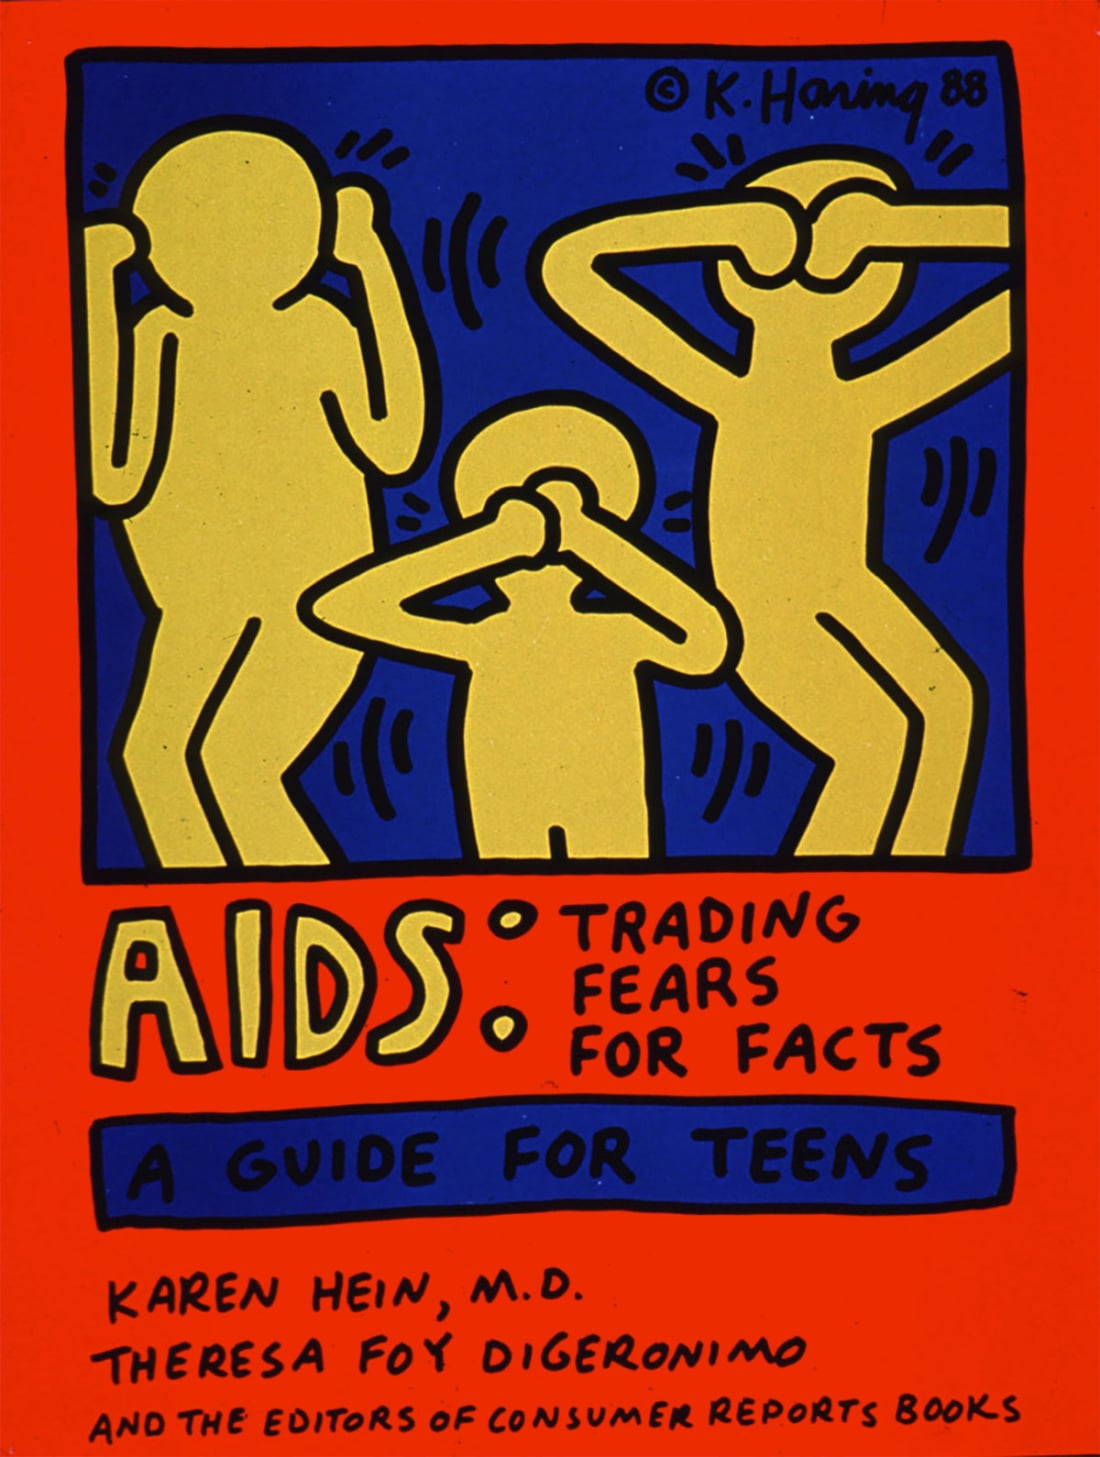 The sudden rise in HIV